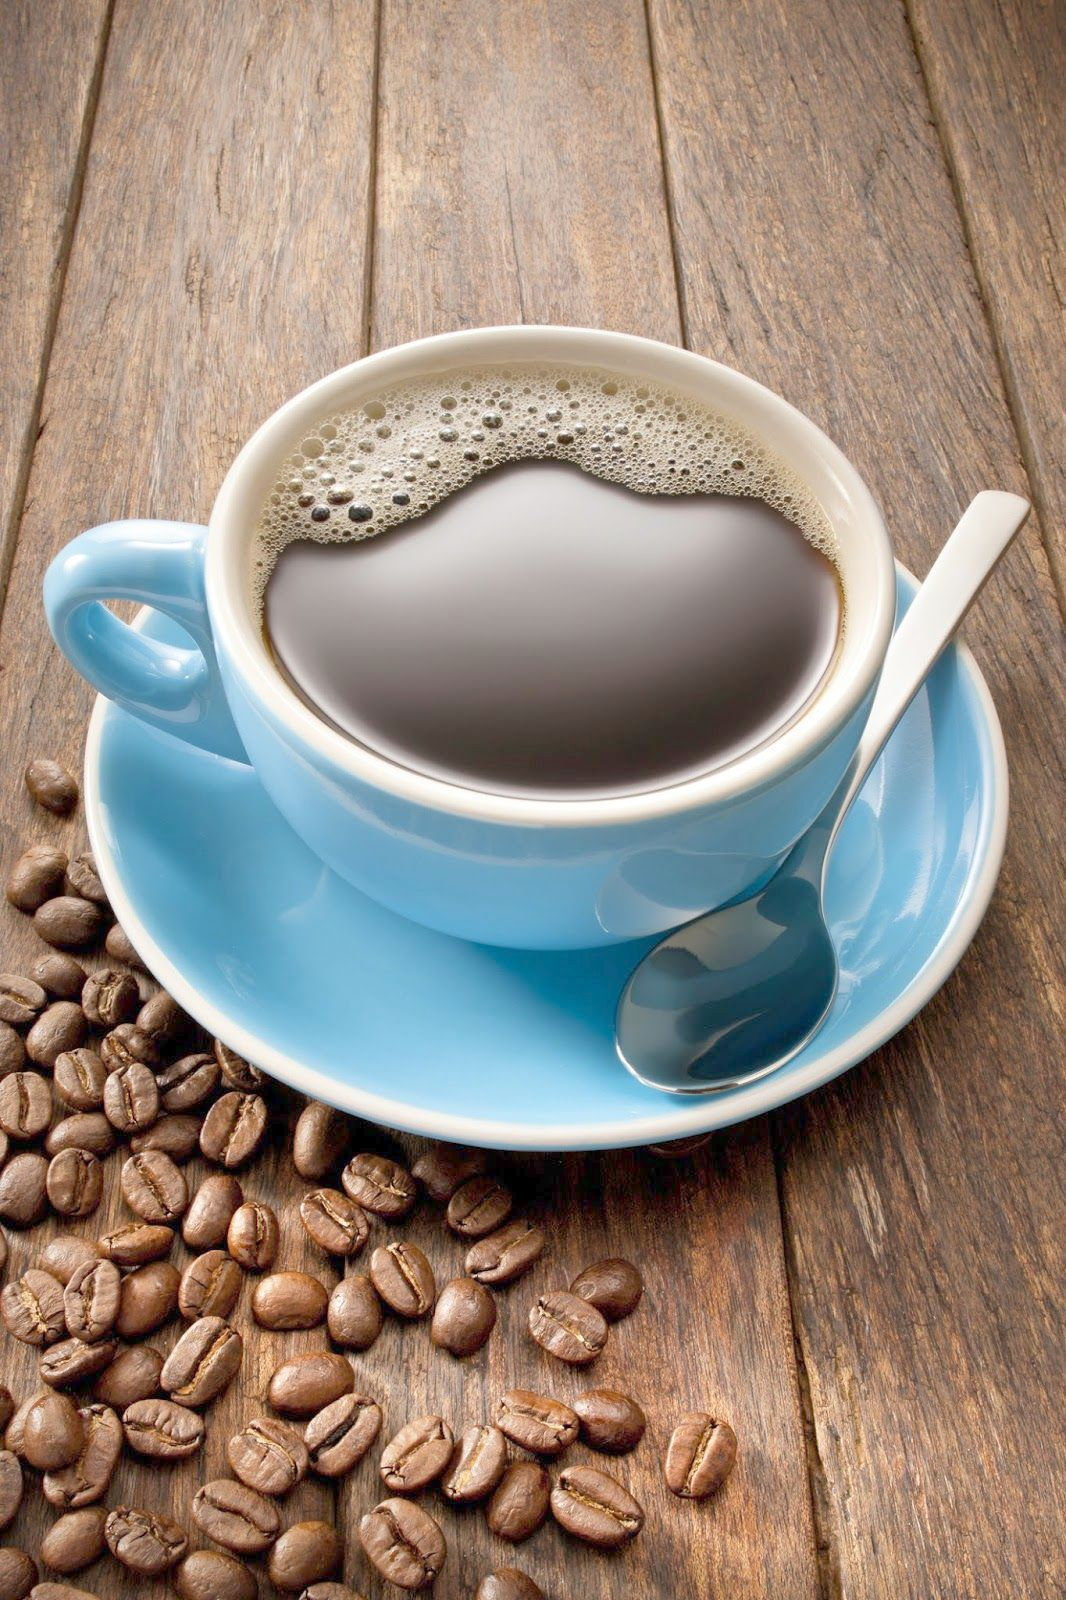 Coffee Maker Rental Coffee Shops Near Me After Coffee Break Senal Y Ruido Youtube In Coffee Maker Pot These Coffee Shops N Mini Desserts Cafe Coeur Tasse Cafe